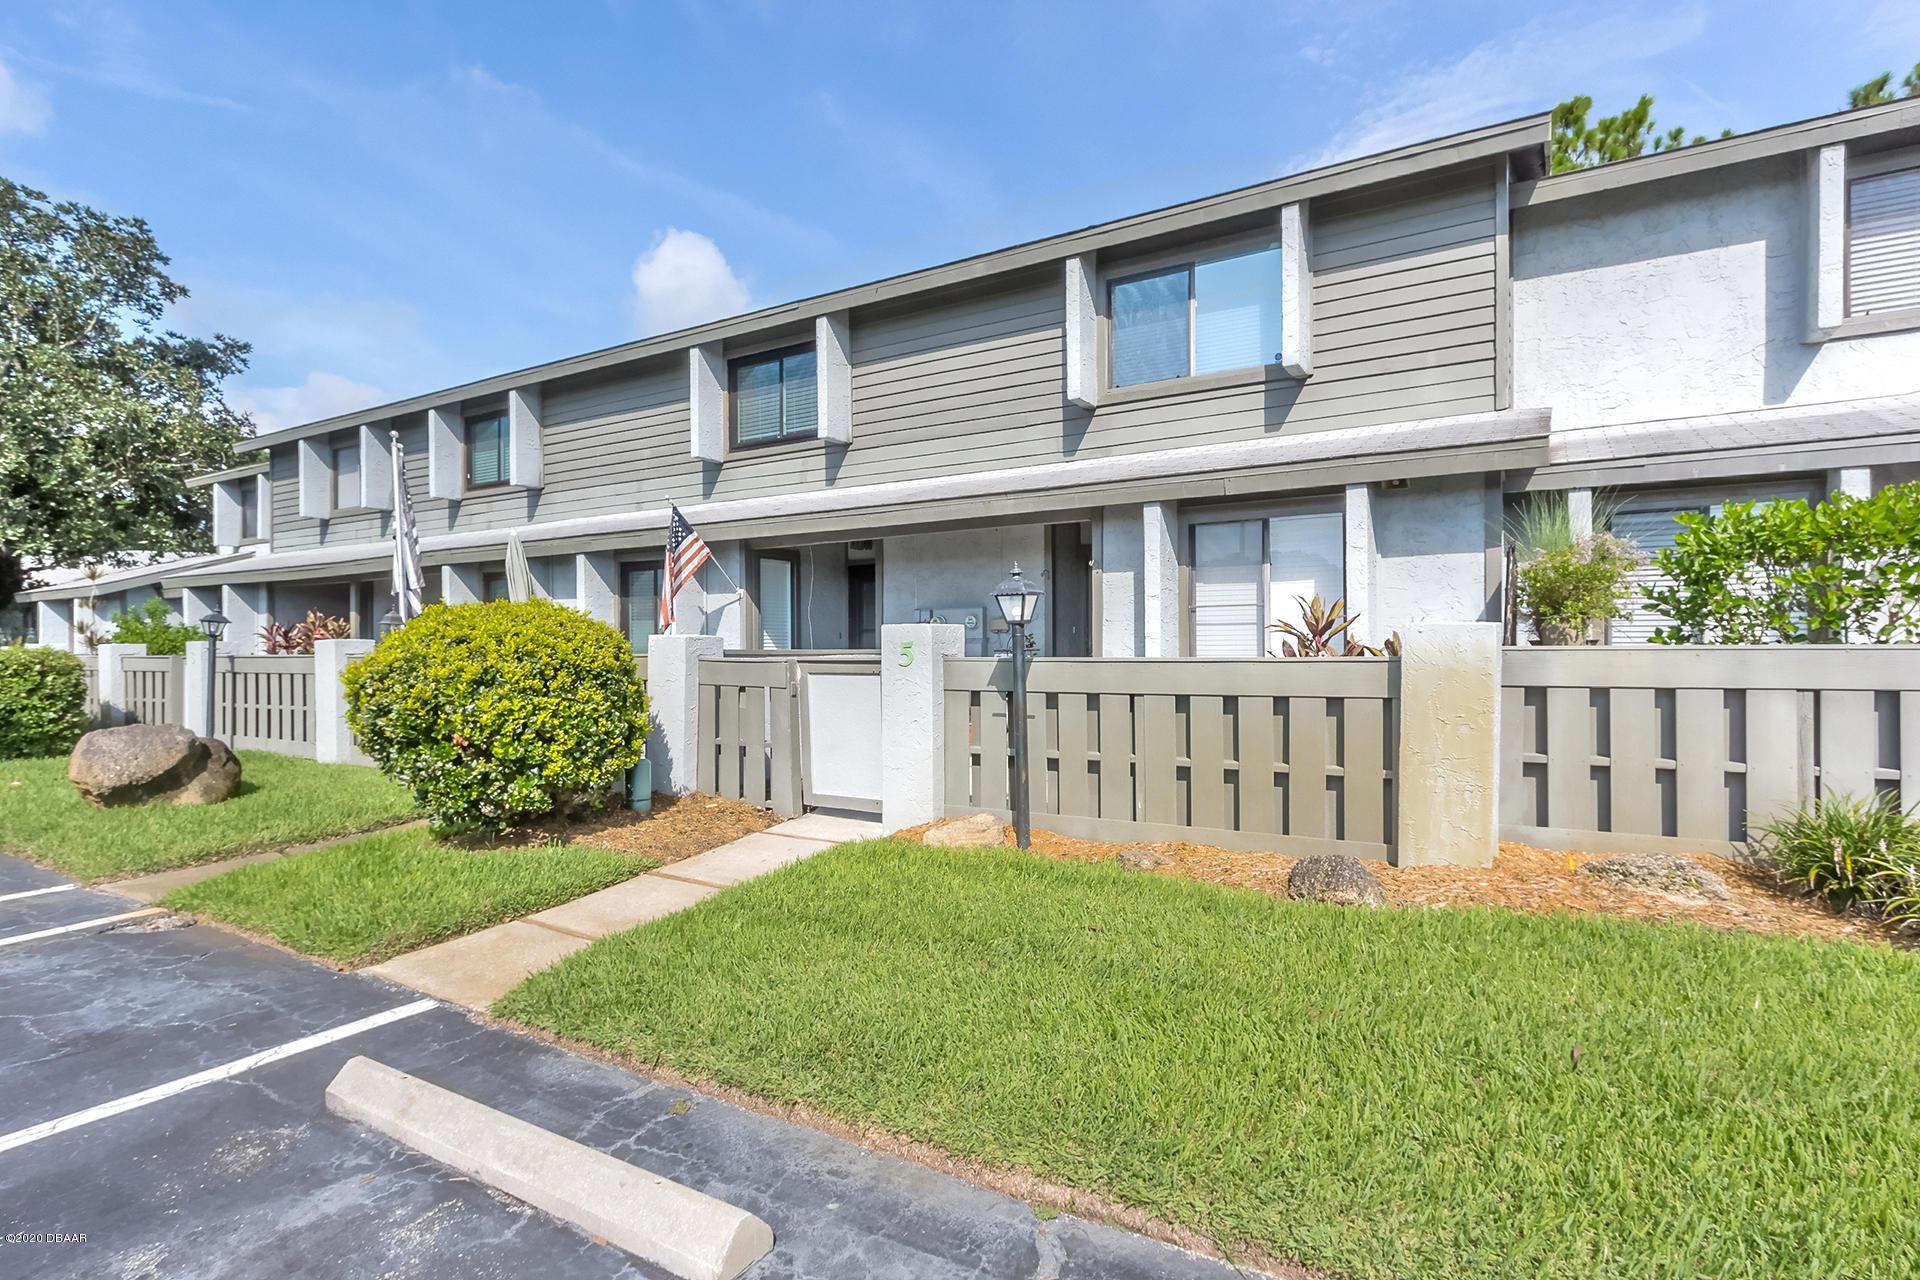 Photo of 140 Limewood Place #E (5), Ormond Beach, FL 32174